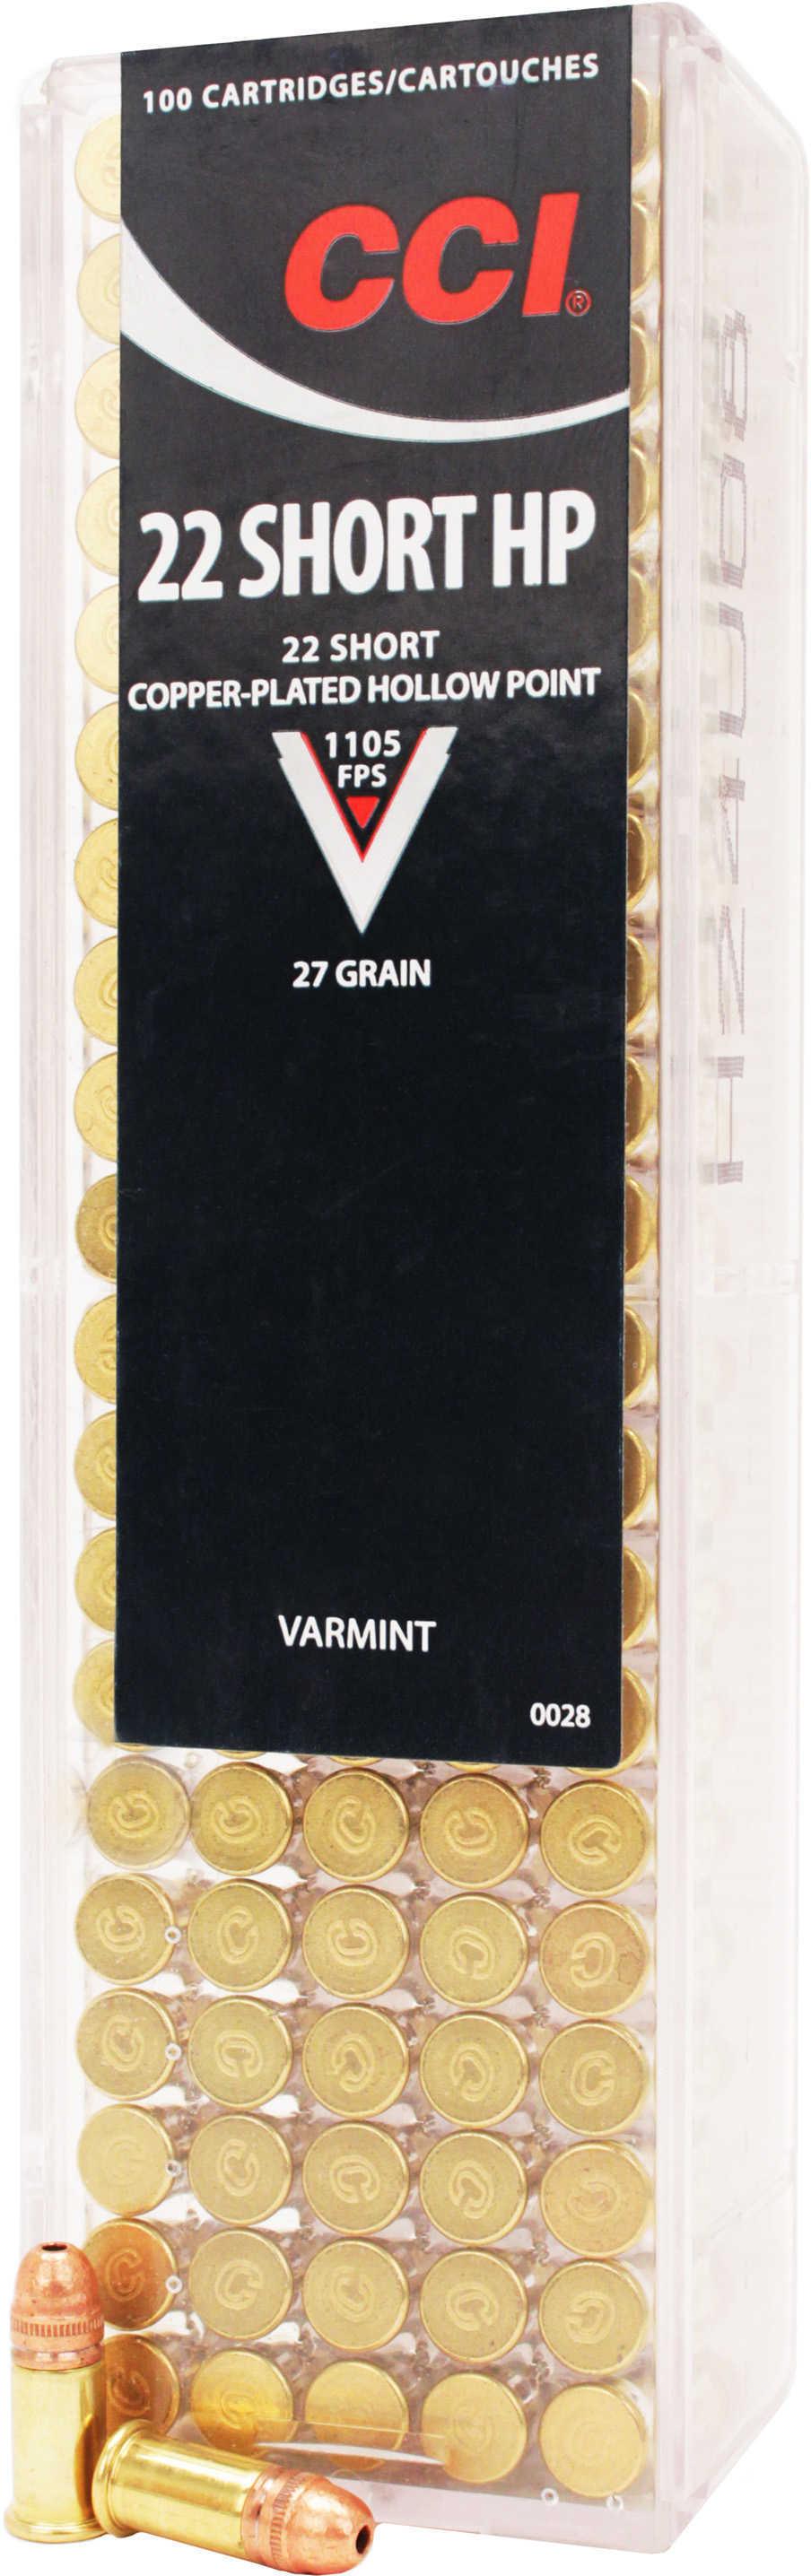 CCI Varmint 22 Short 27 gr Copper Plated Hollow Point (CPHP) 100 Bx